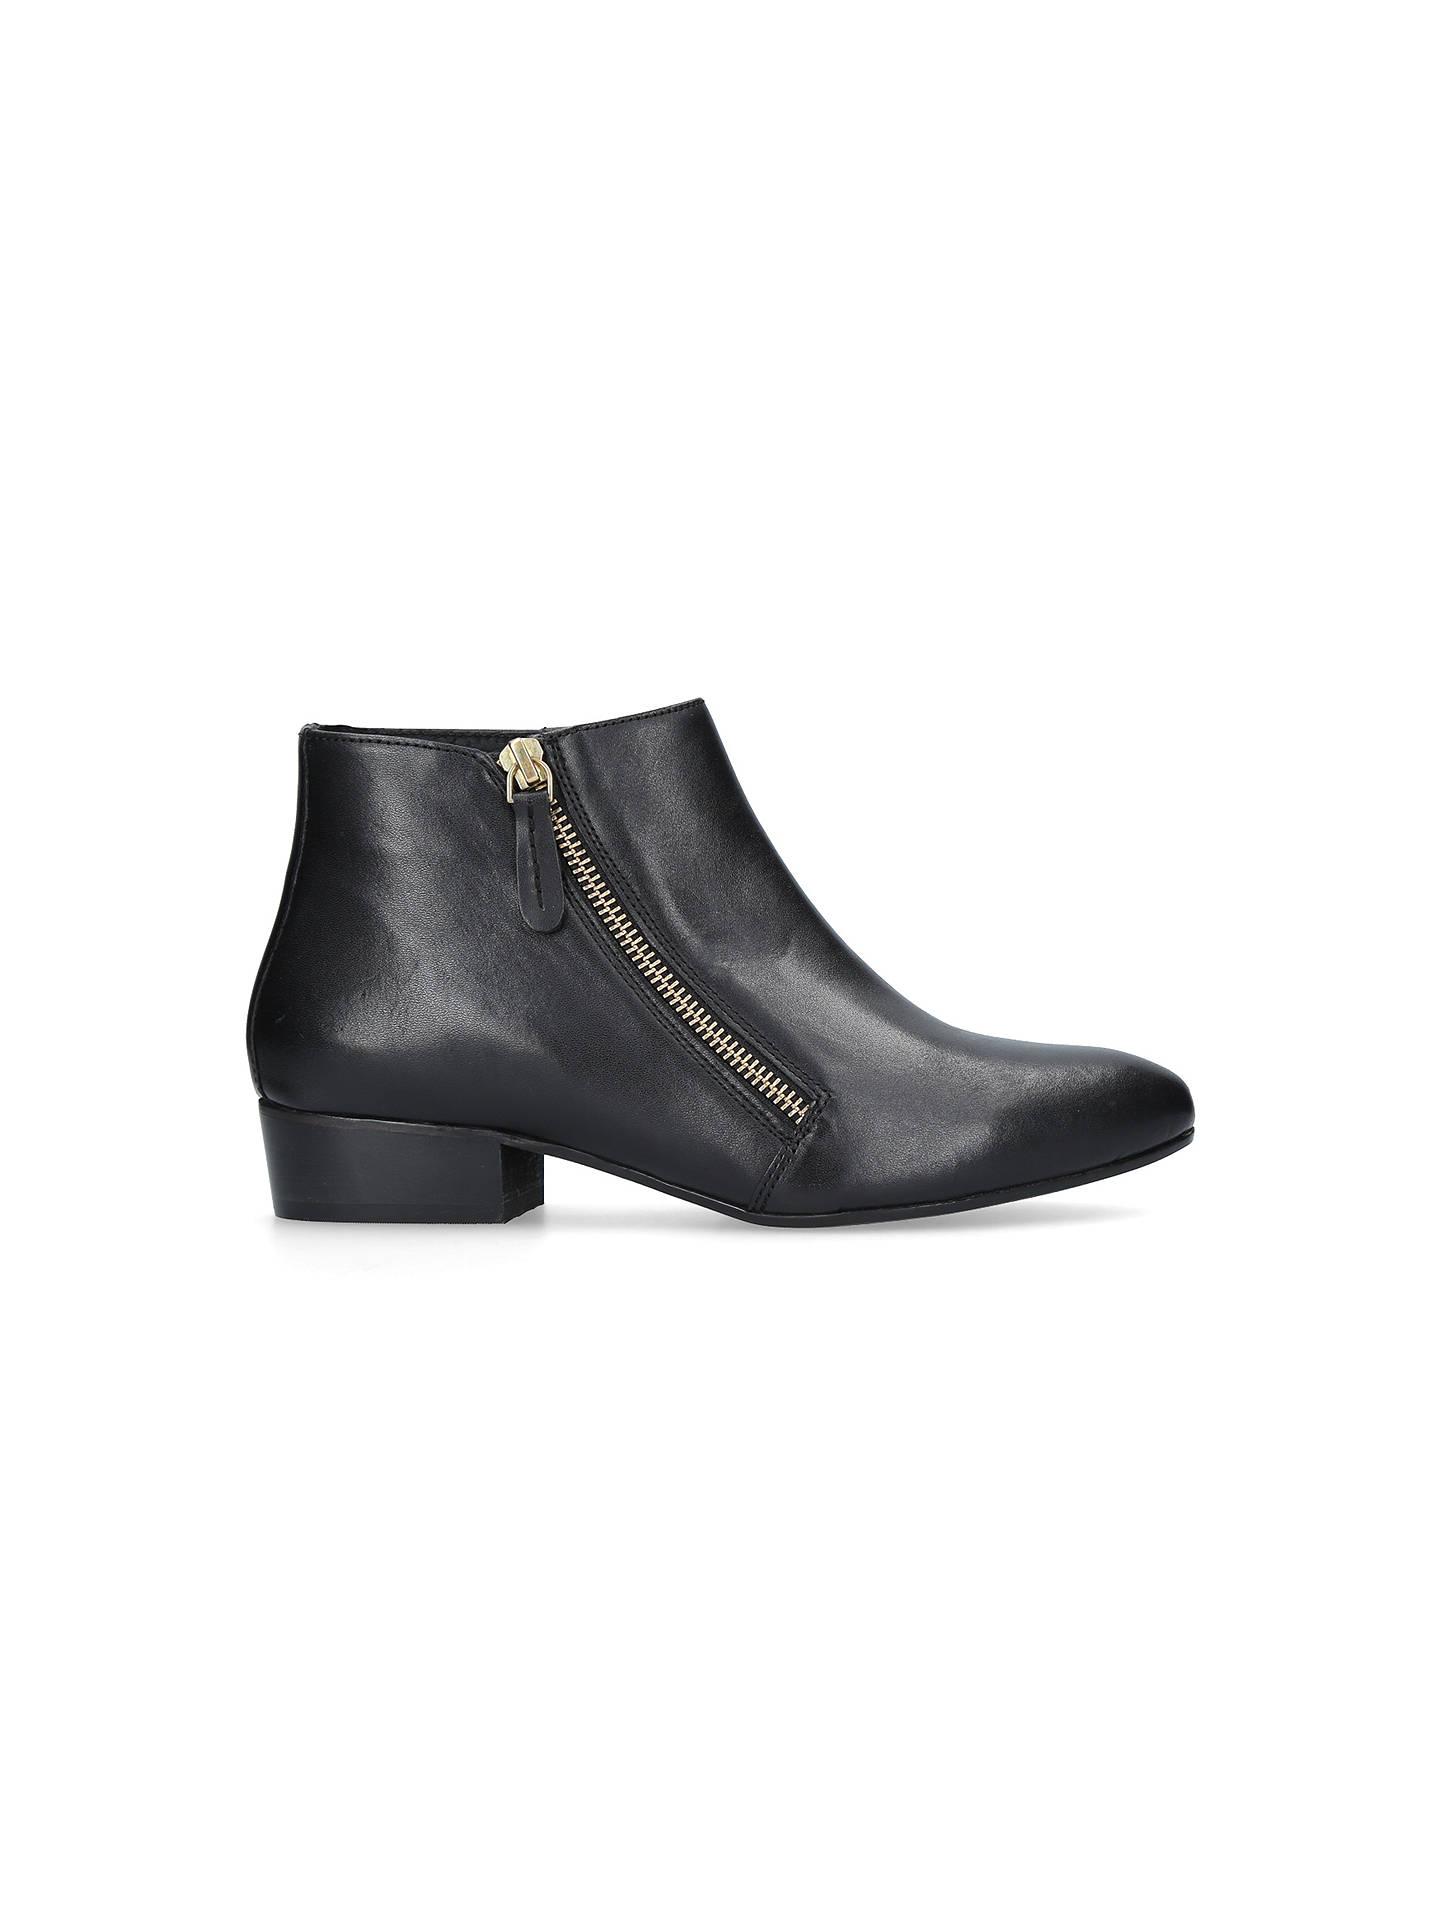 45a2d508fb43 Buy Kurt Geiger London Sally Asymmetric Zip Ankle Boots